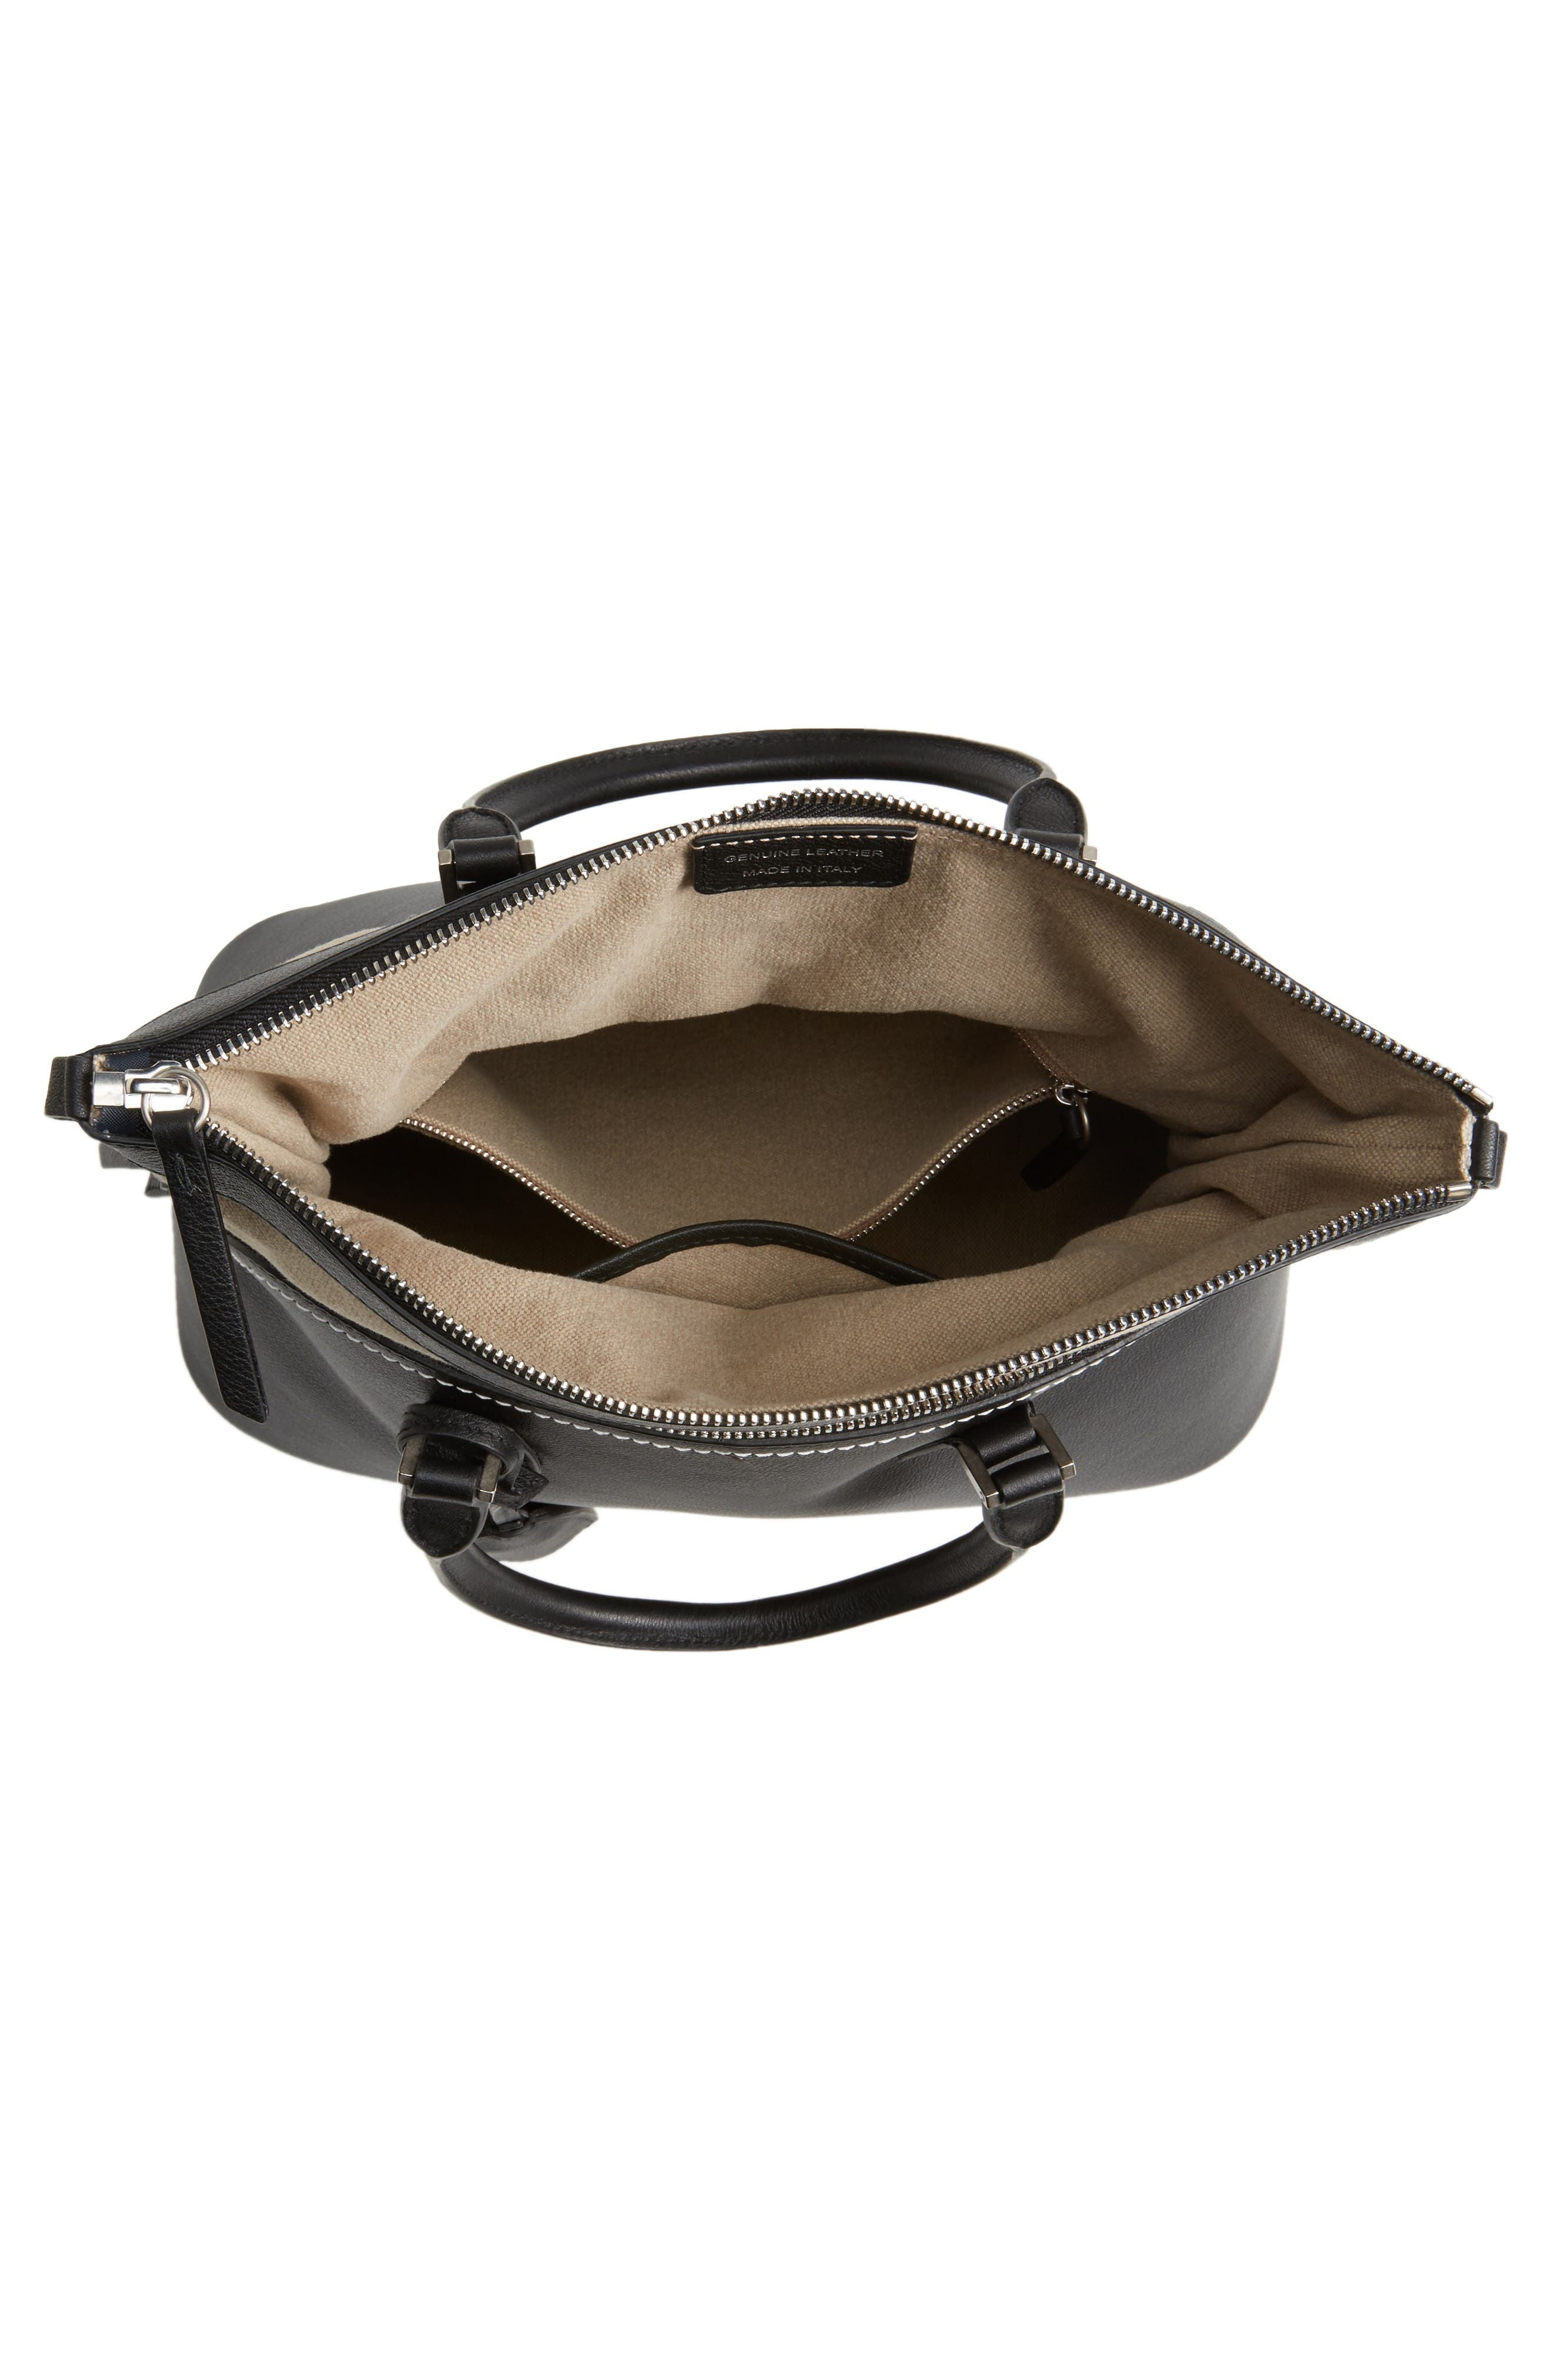 Medium 5AC Leather Handbag,                             Alternate thumbnail 4, color,                             001